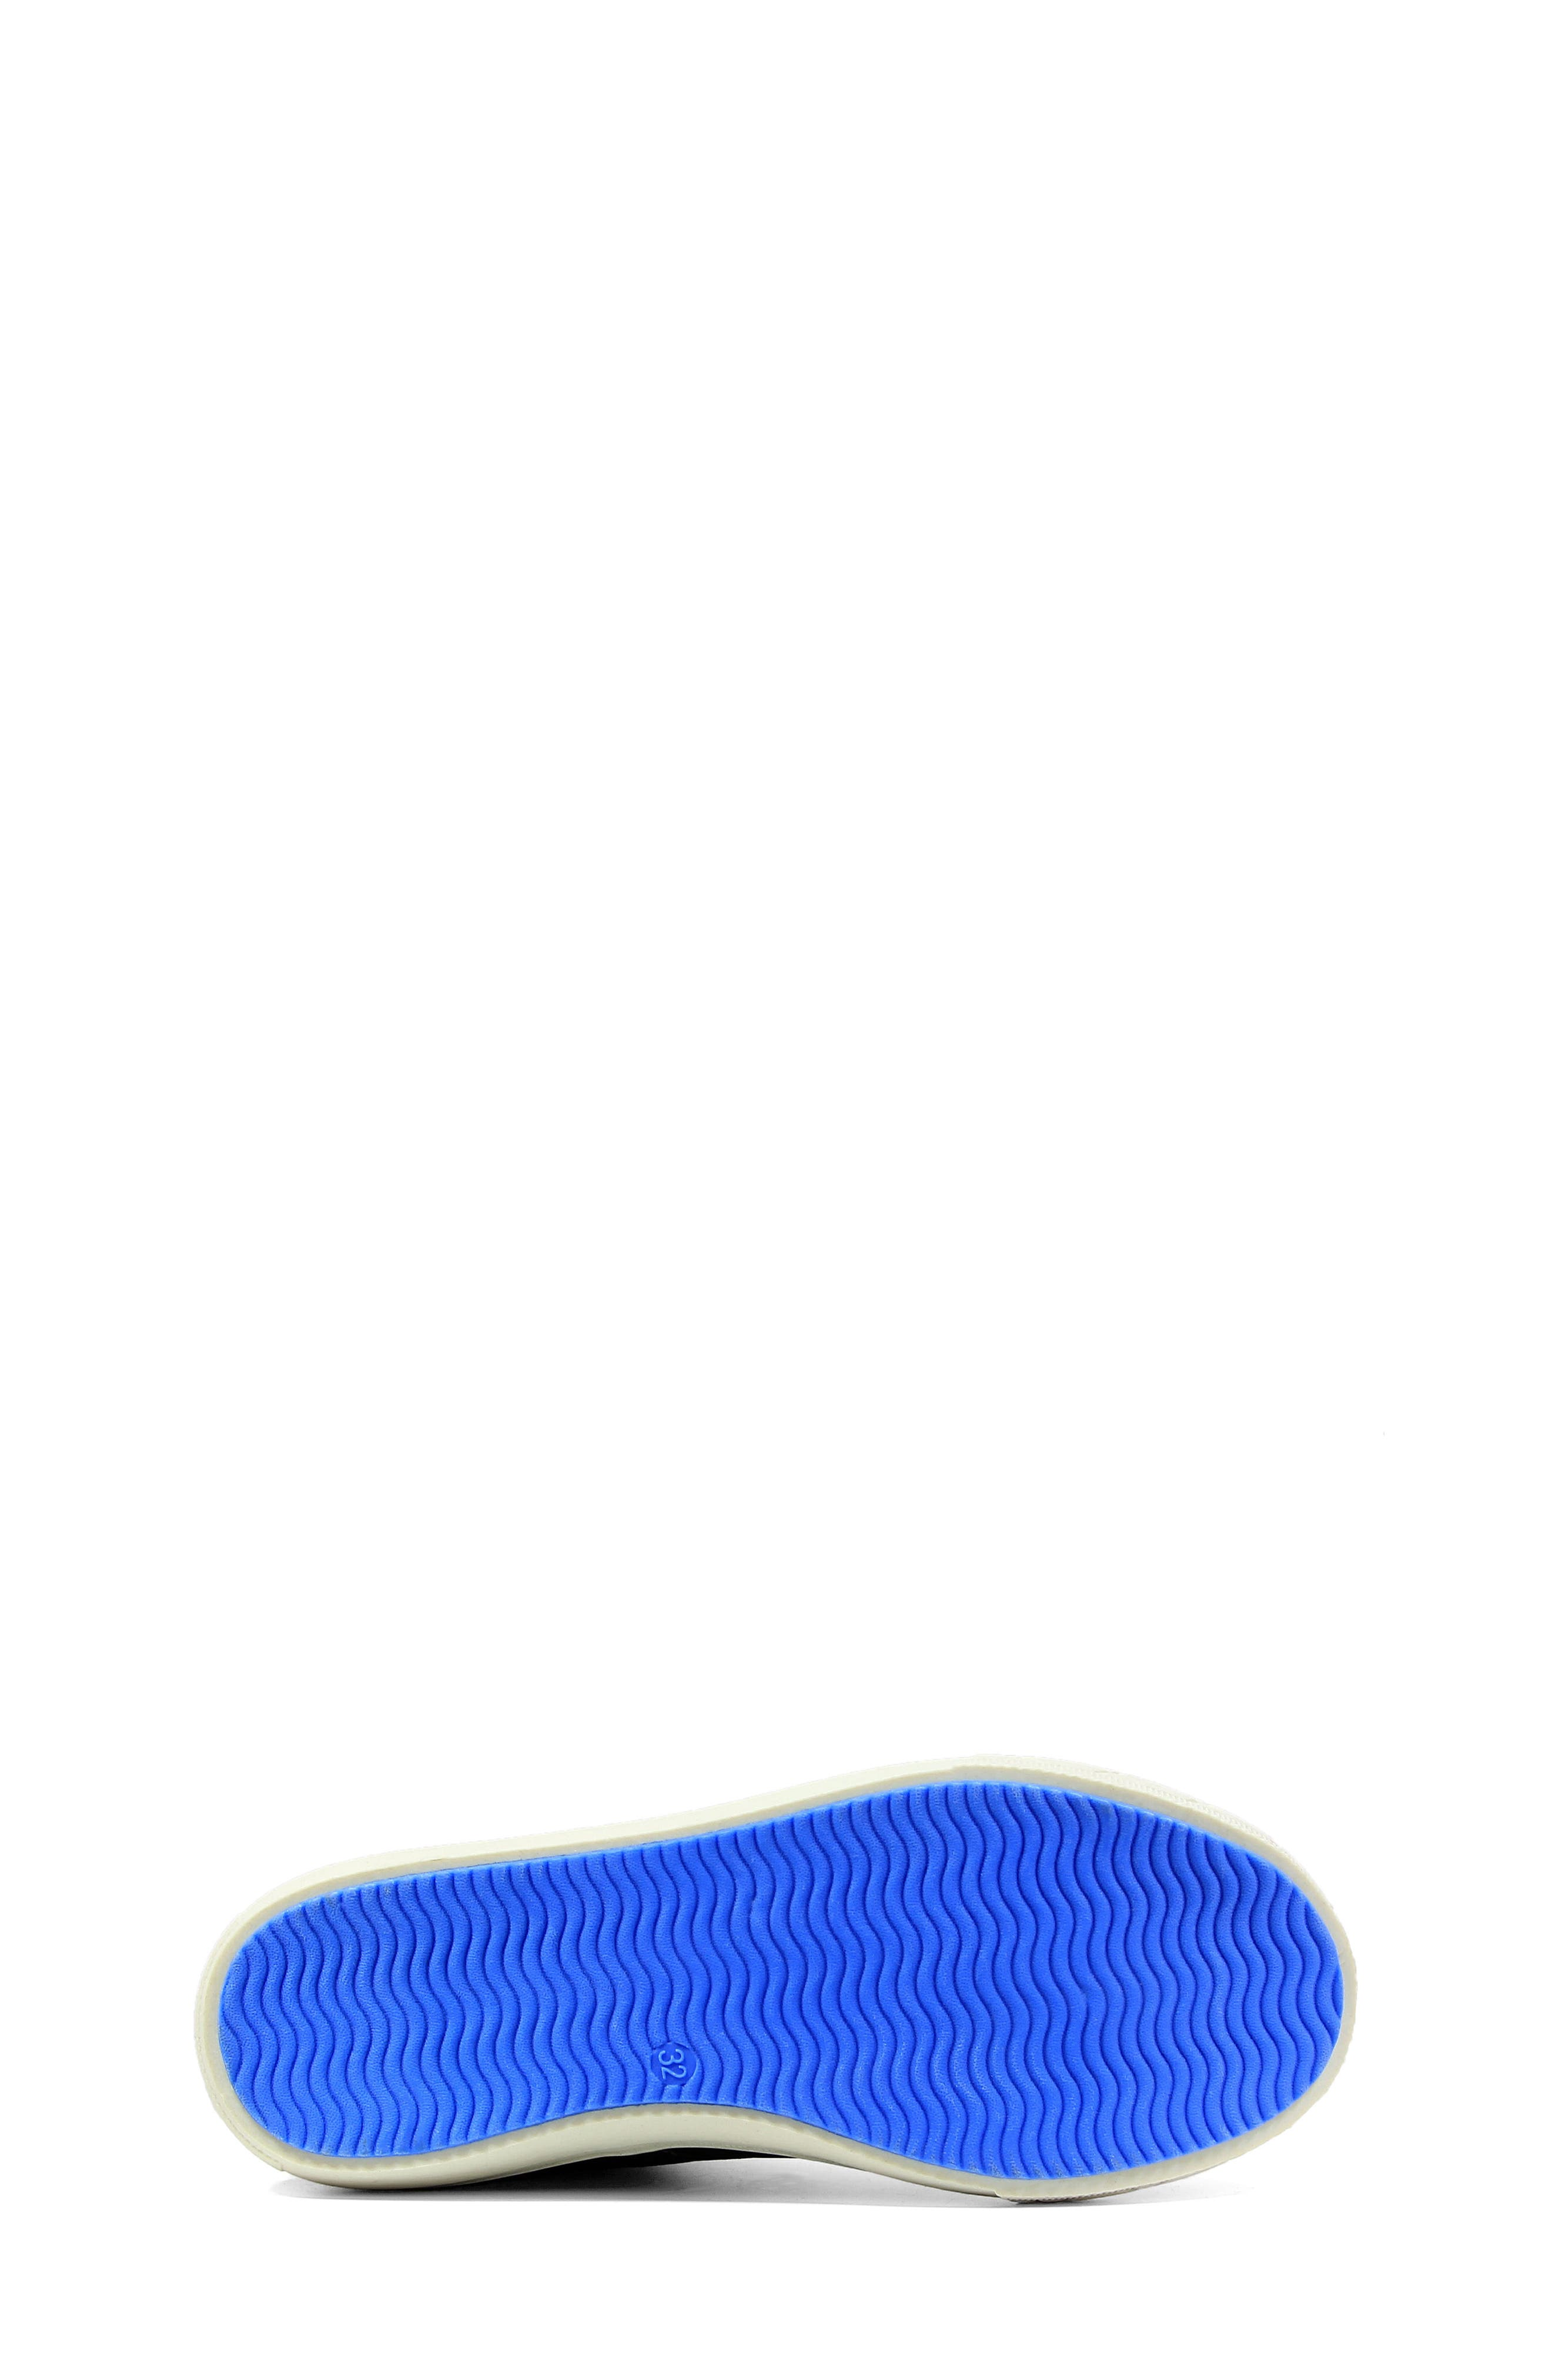 Curb Chukka Sneaker Boot,                             Alternate thumbnail 6, color,                             Black